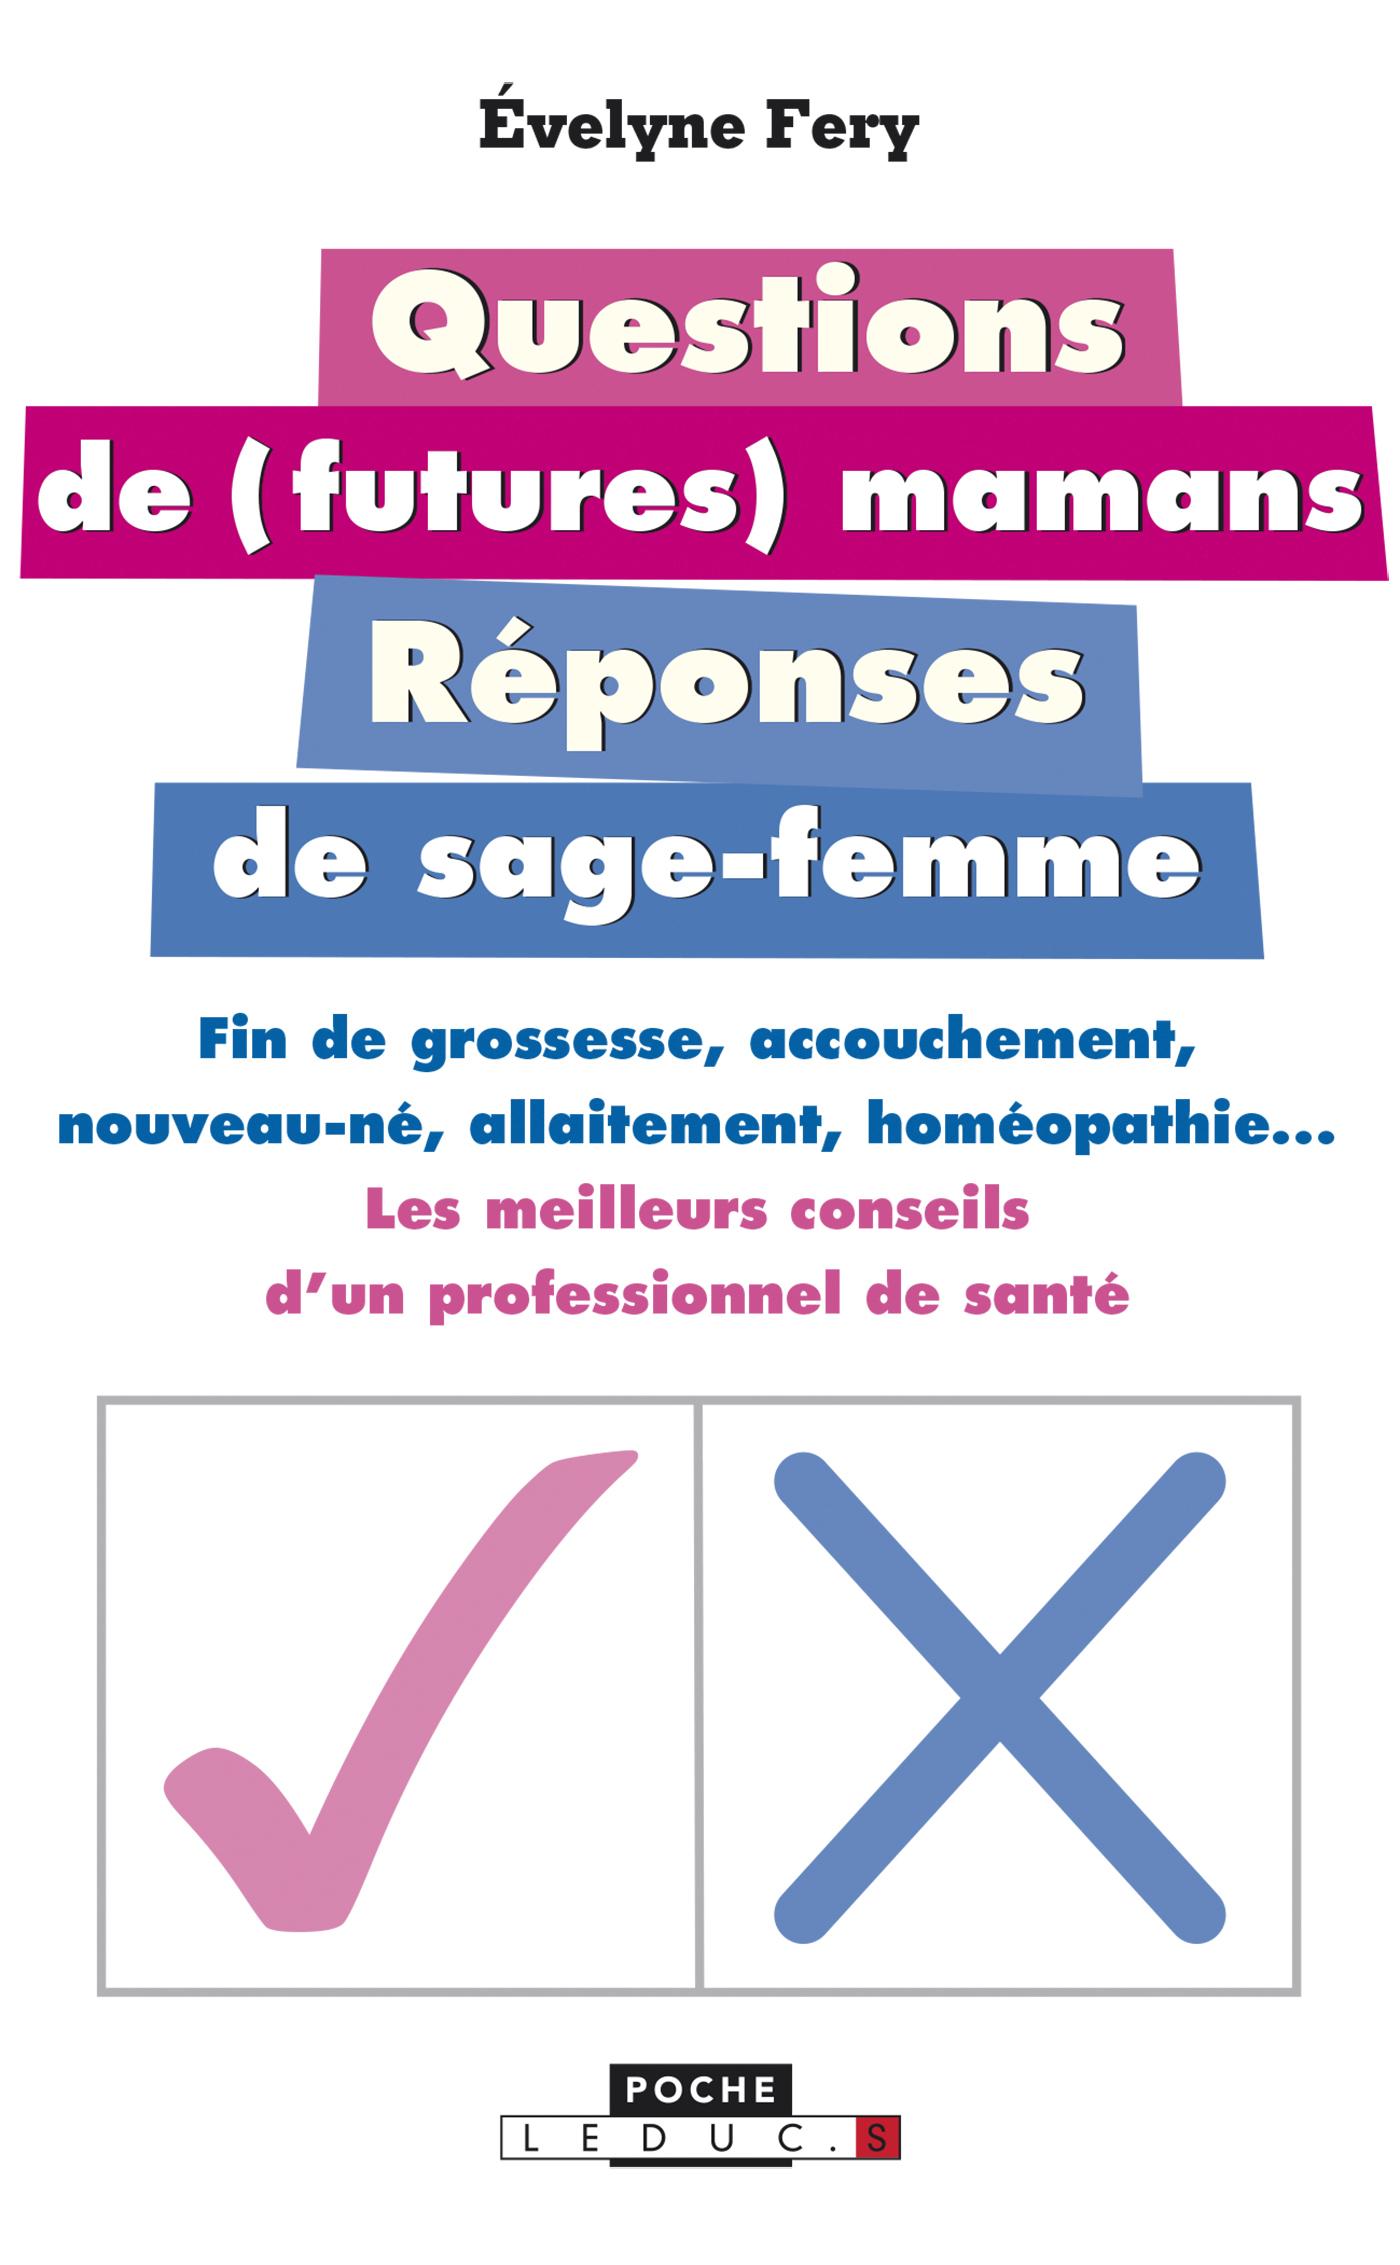 QUESTIONS DE (FUTURES) MAMANS REPONSES DE SAGE-FEMME